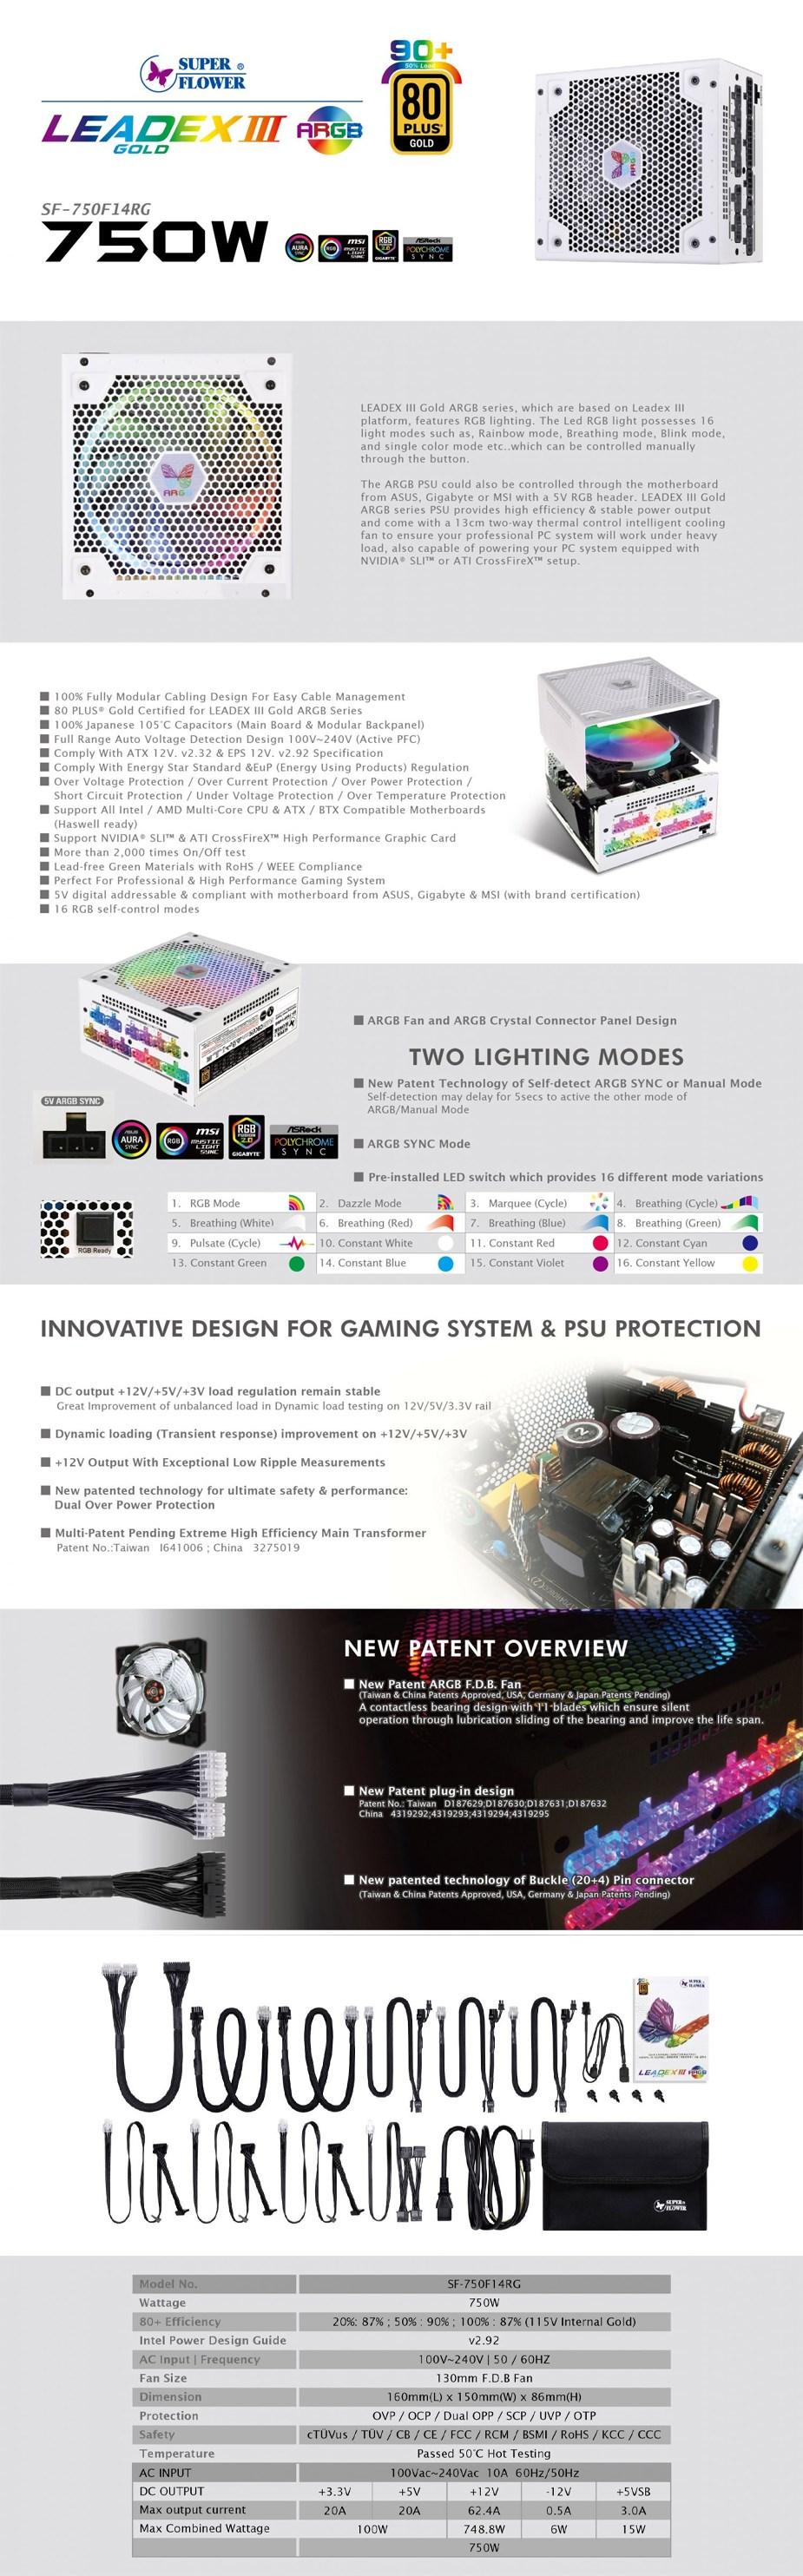 Super Flower Leadex III 750W 80 Plus Gold Fully Modular ARGB Power Supply- Overview 1